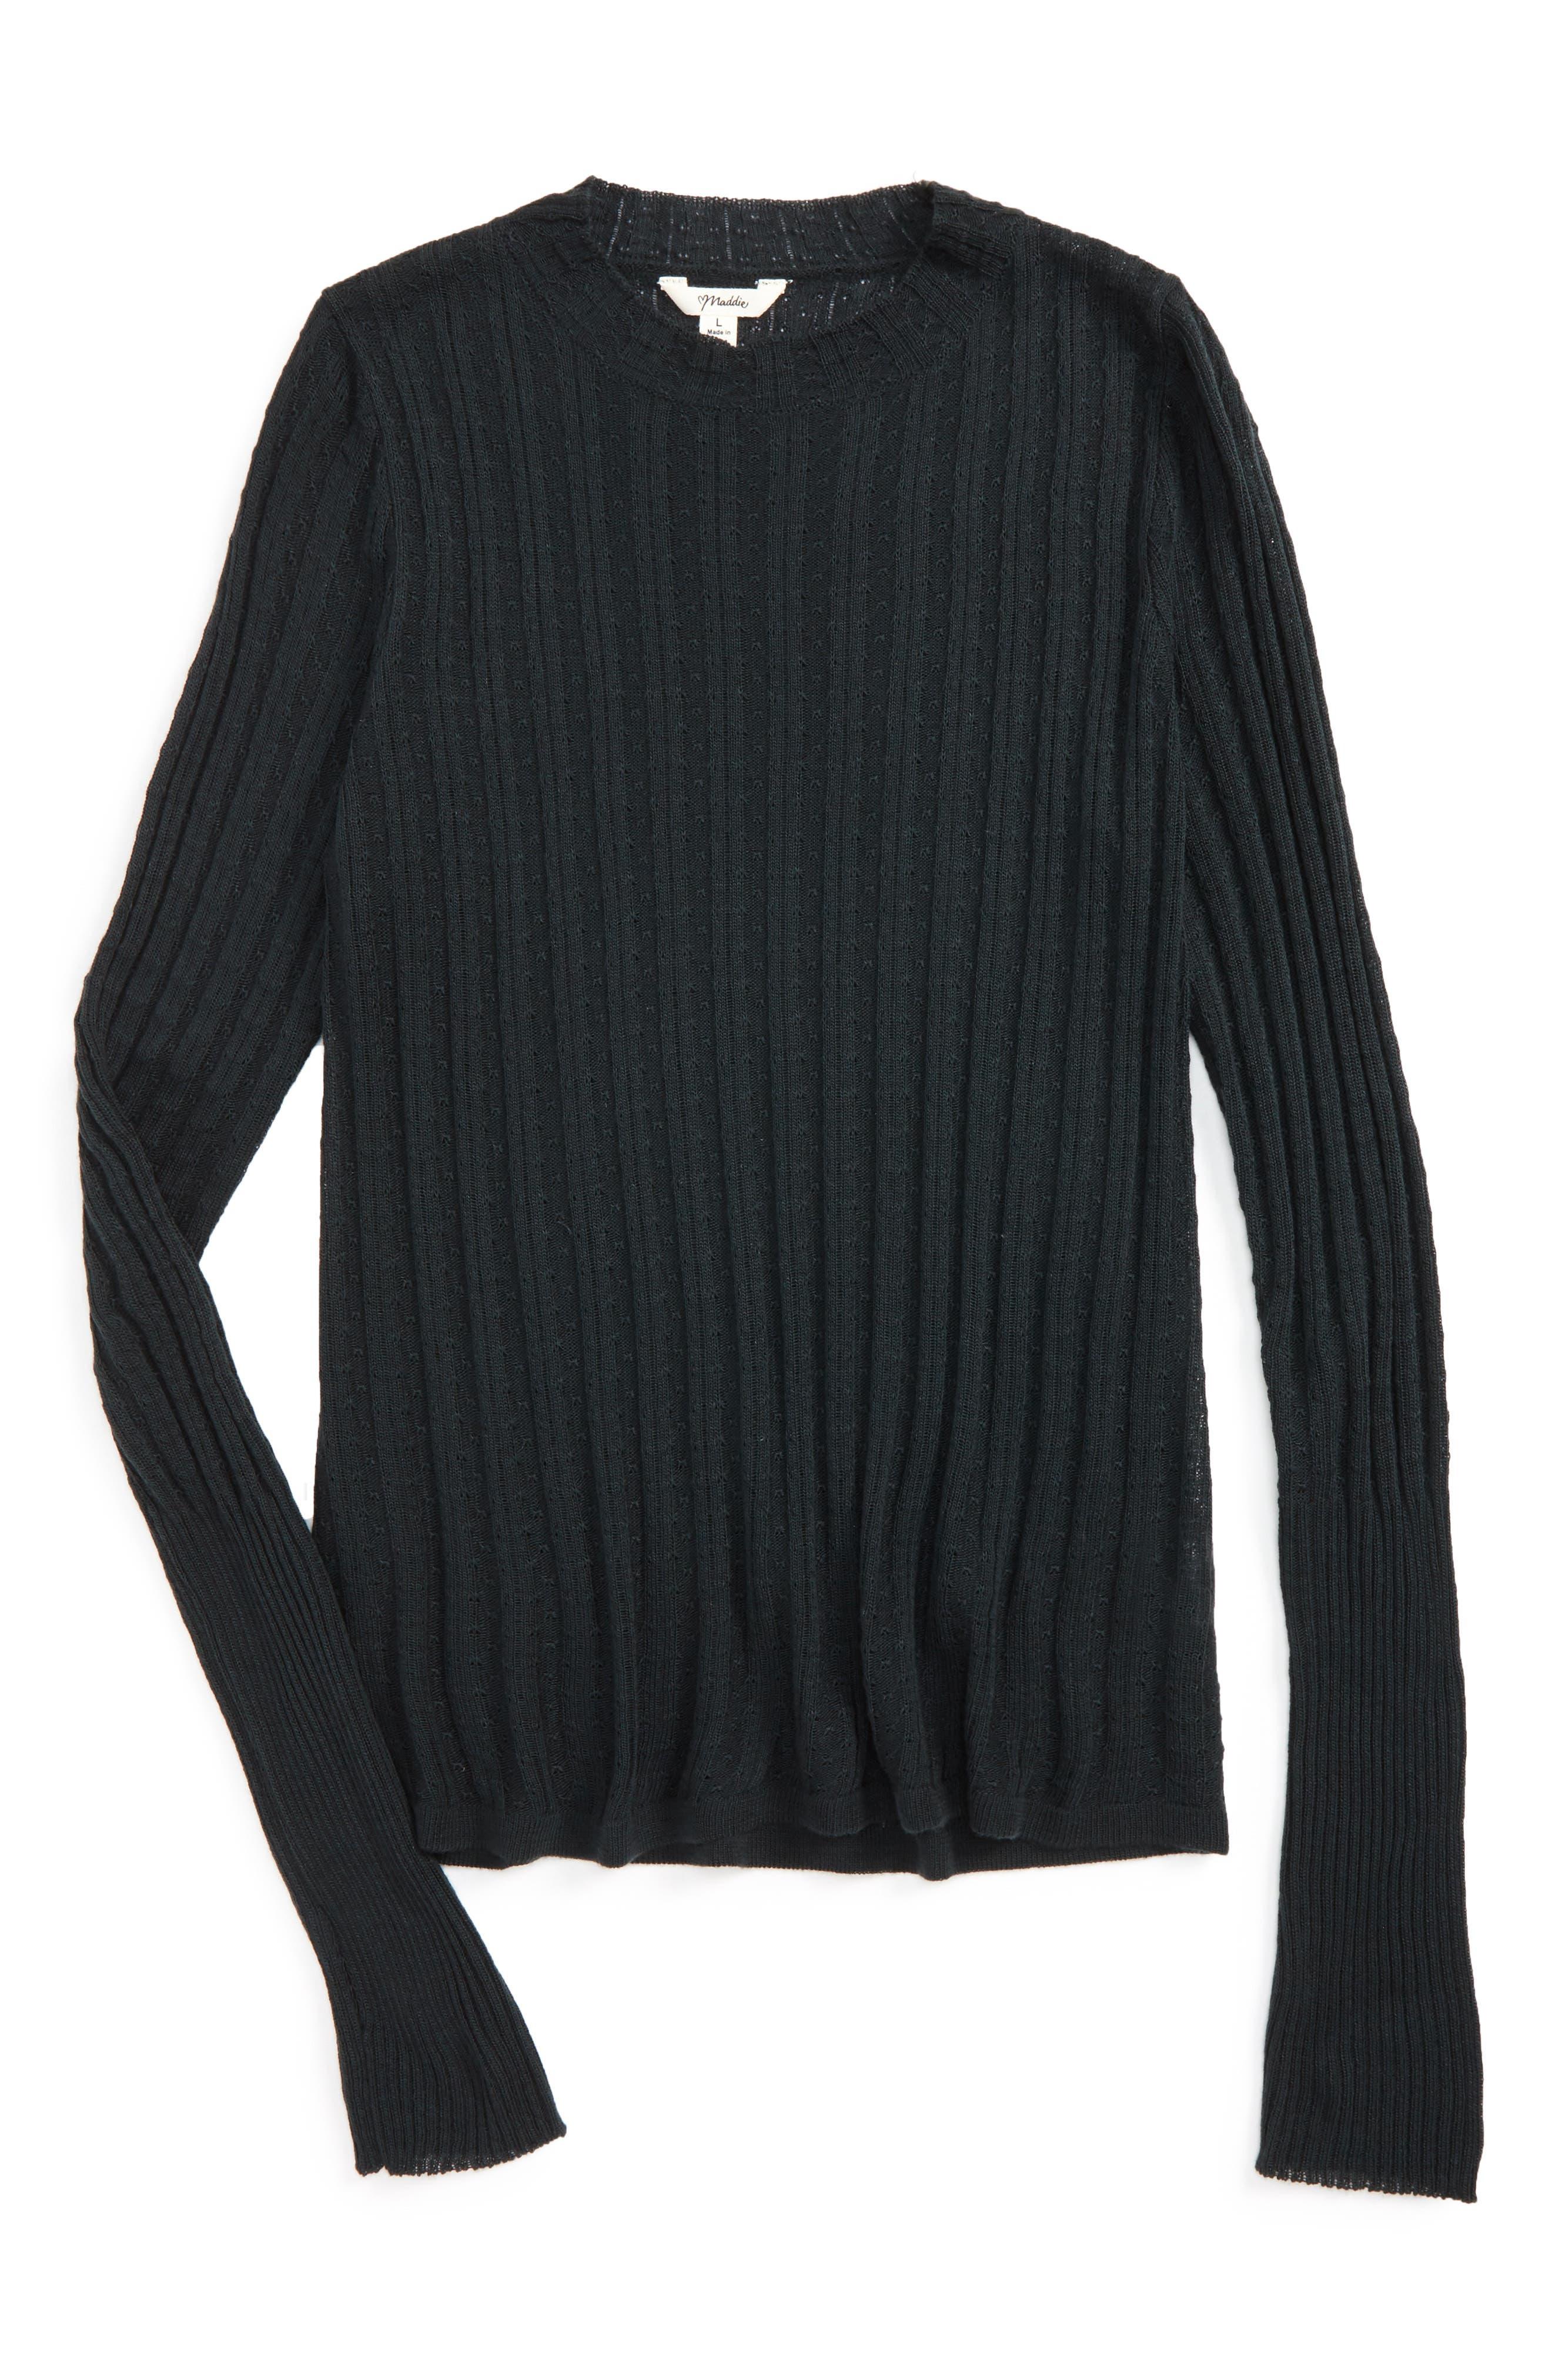 Alternate Image 1 Selected - Maddie Pointelle Mock Neck Sweater (Big Girls)